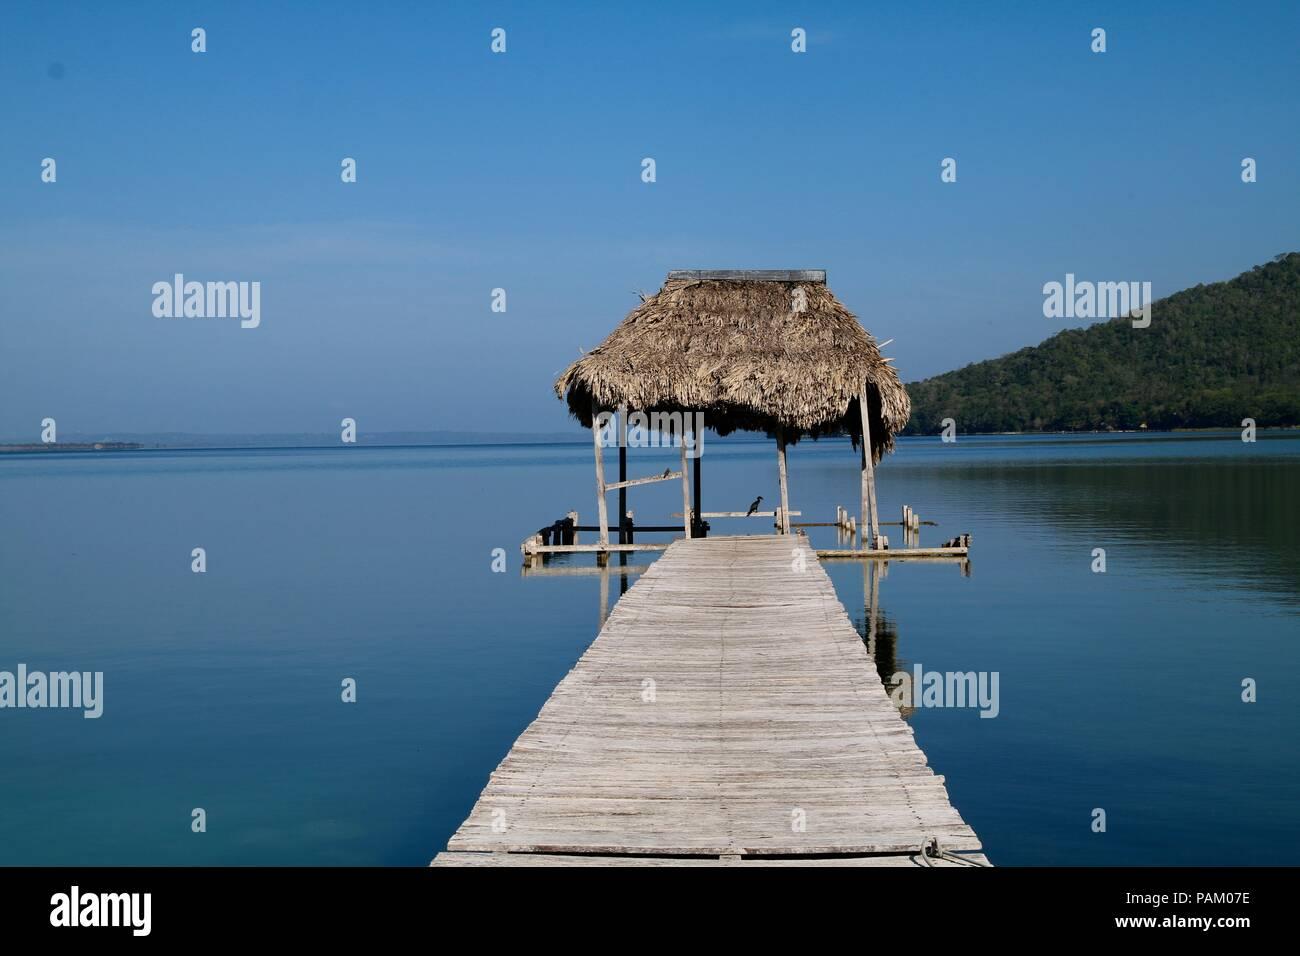 Long boardwalk on a blue lake reflecting a blue sky - Stock Image